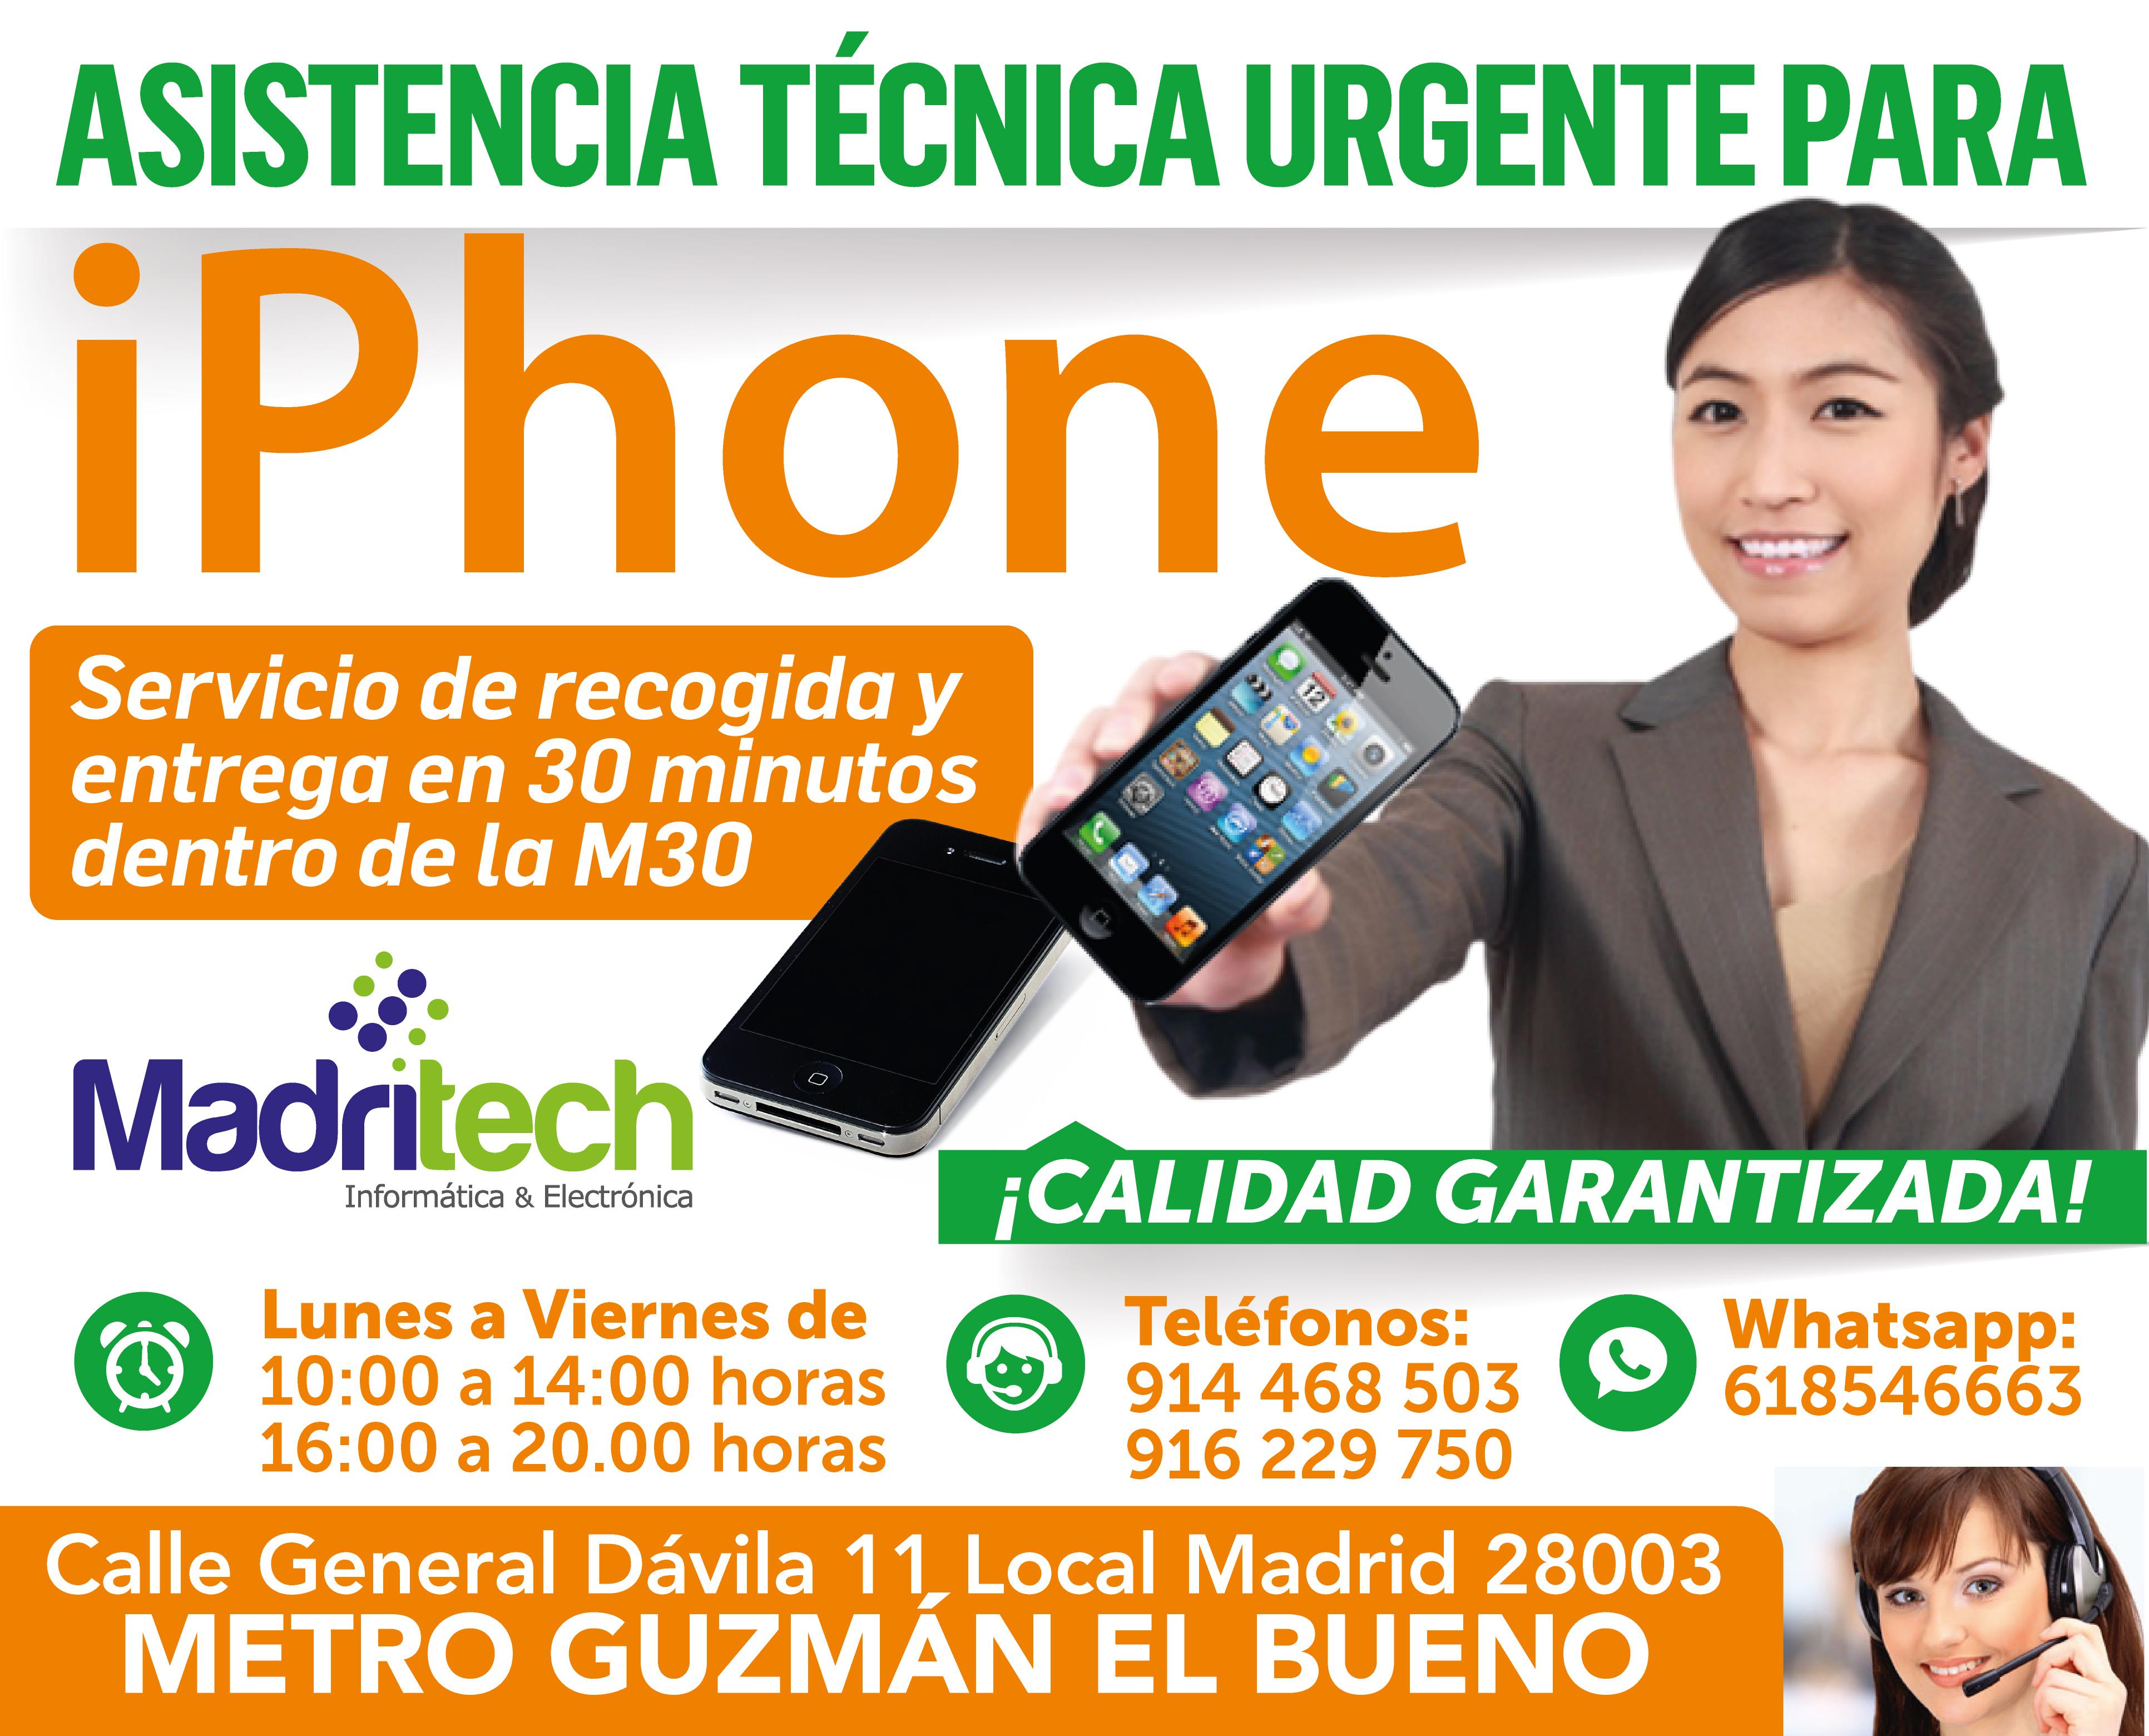 asistencia tecnica urgente para iphone madritech